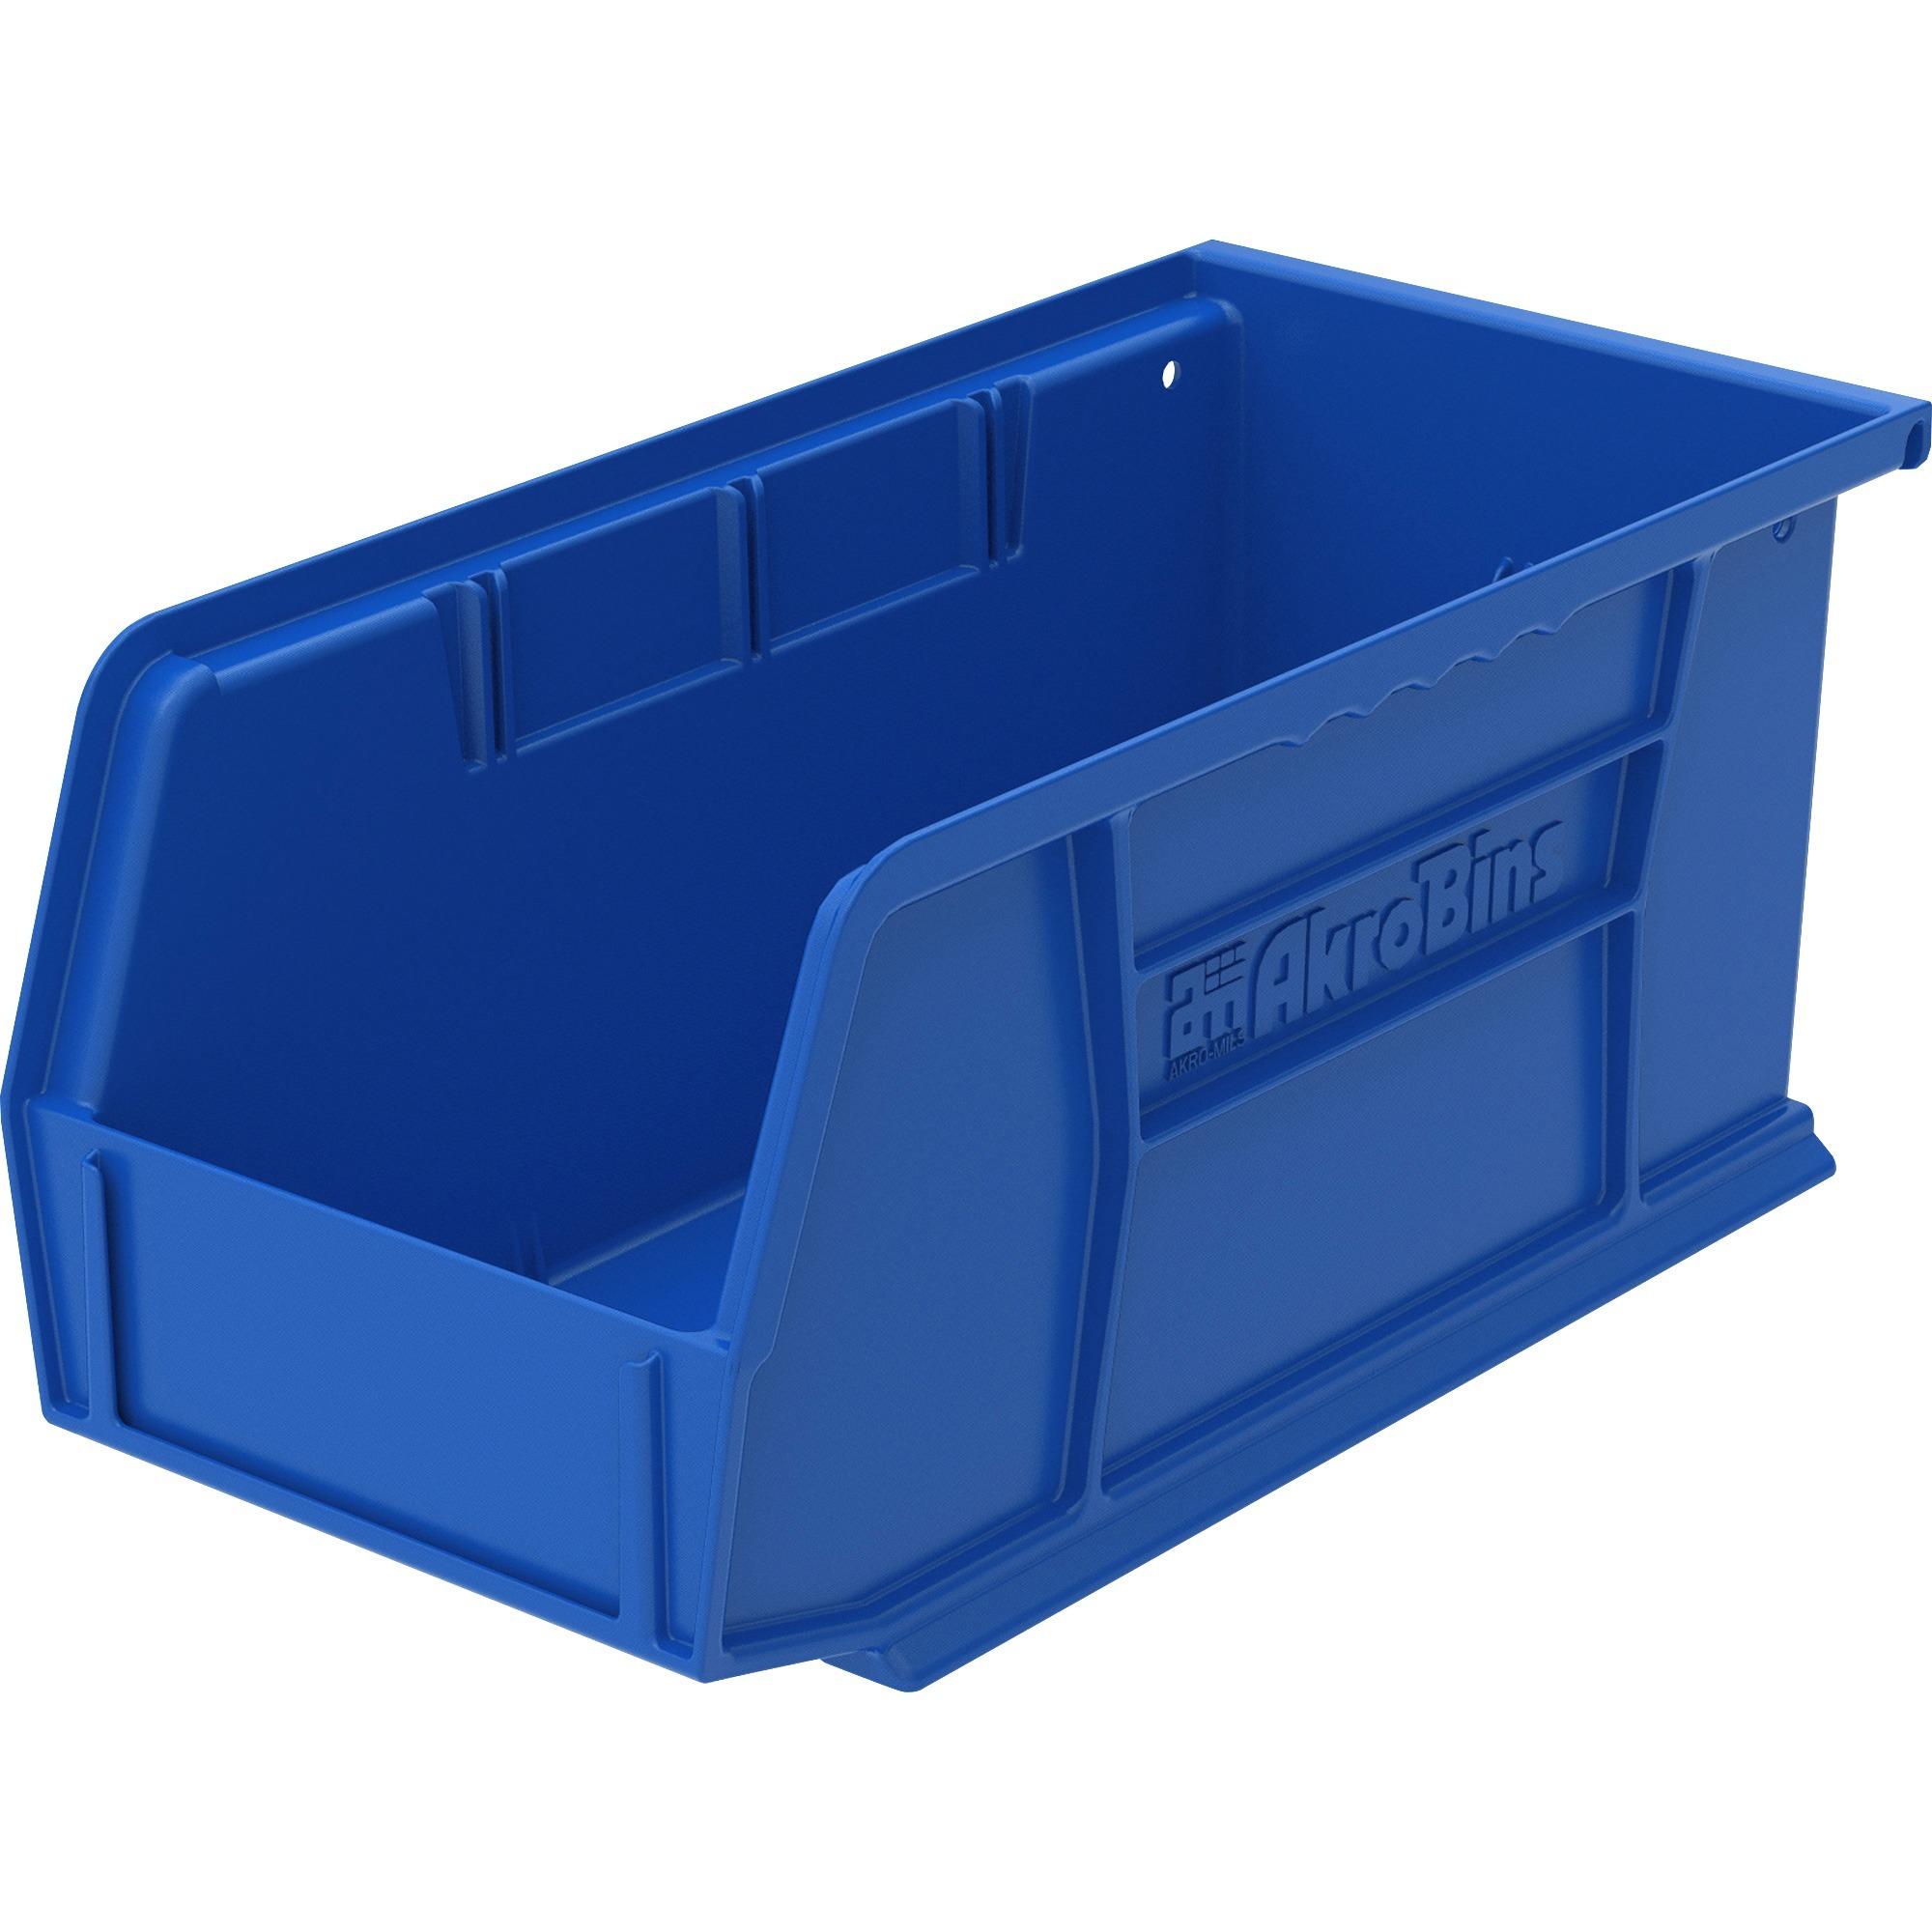 Image for Akro-mils / Myers Industries, Inc Akro-mils Akrobin - 5 Height X 5.5 Width X 10.9 Depth - Rack-mountable - Blue - Polymer - 1 / Each